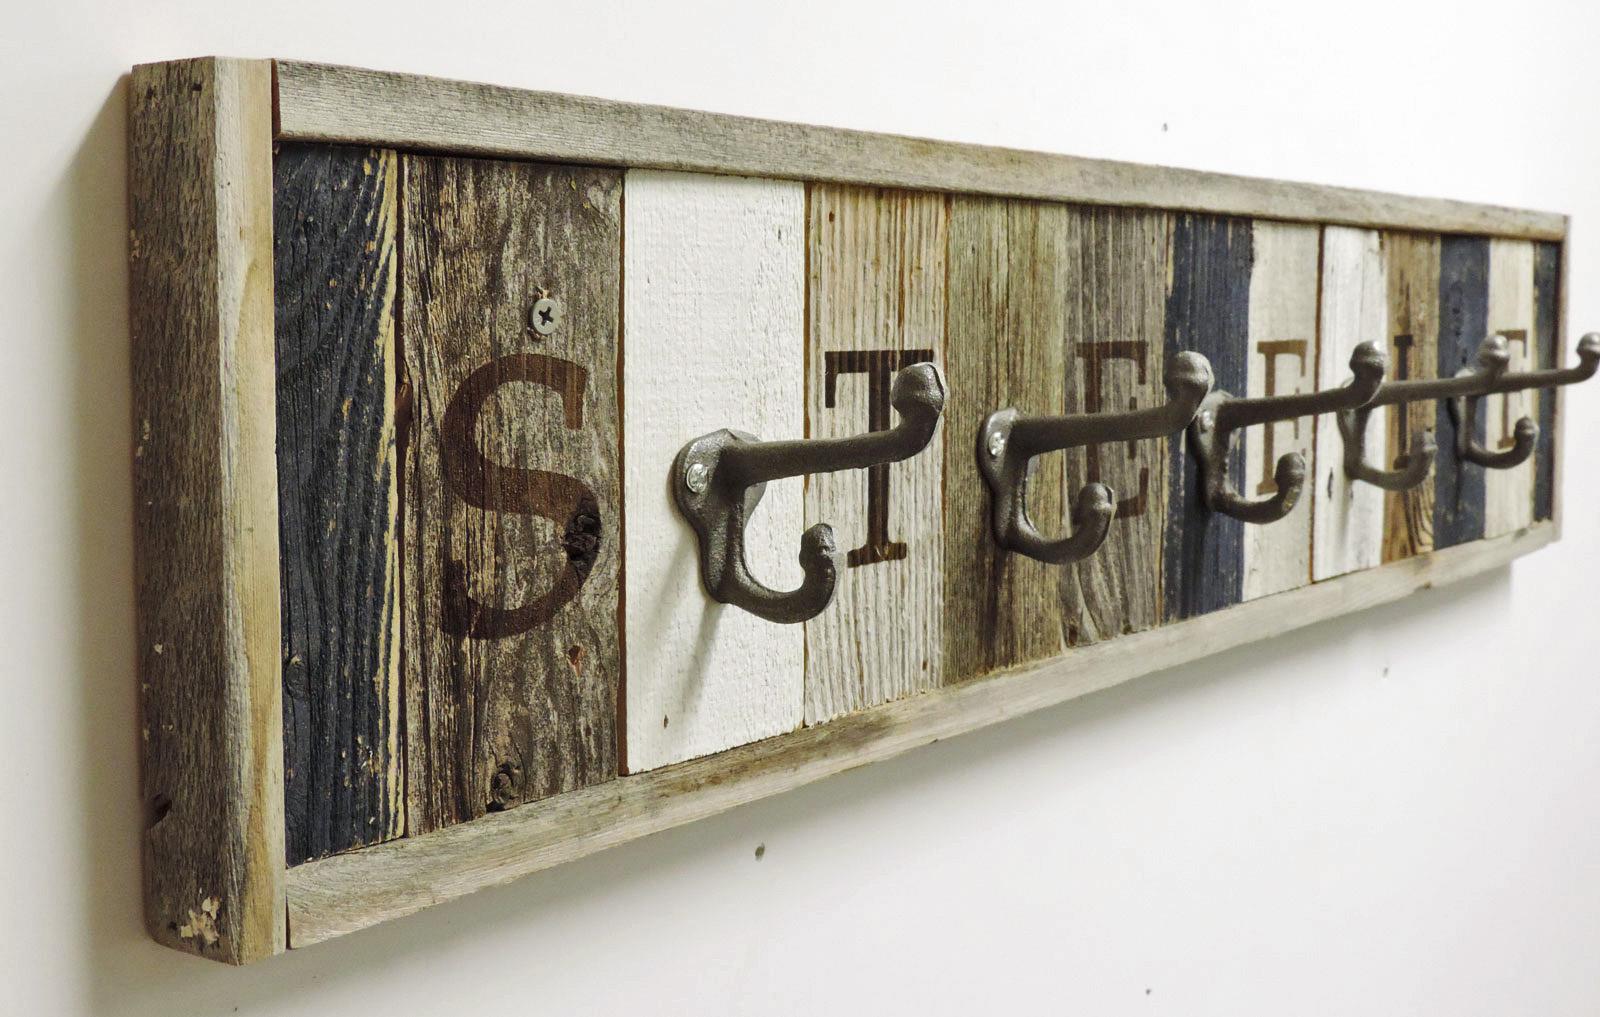 Personalized Reclaimed Wooden Coat Rack Barn Wood Hooks Allbarnwood